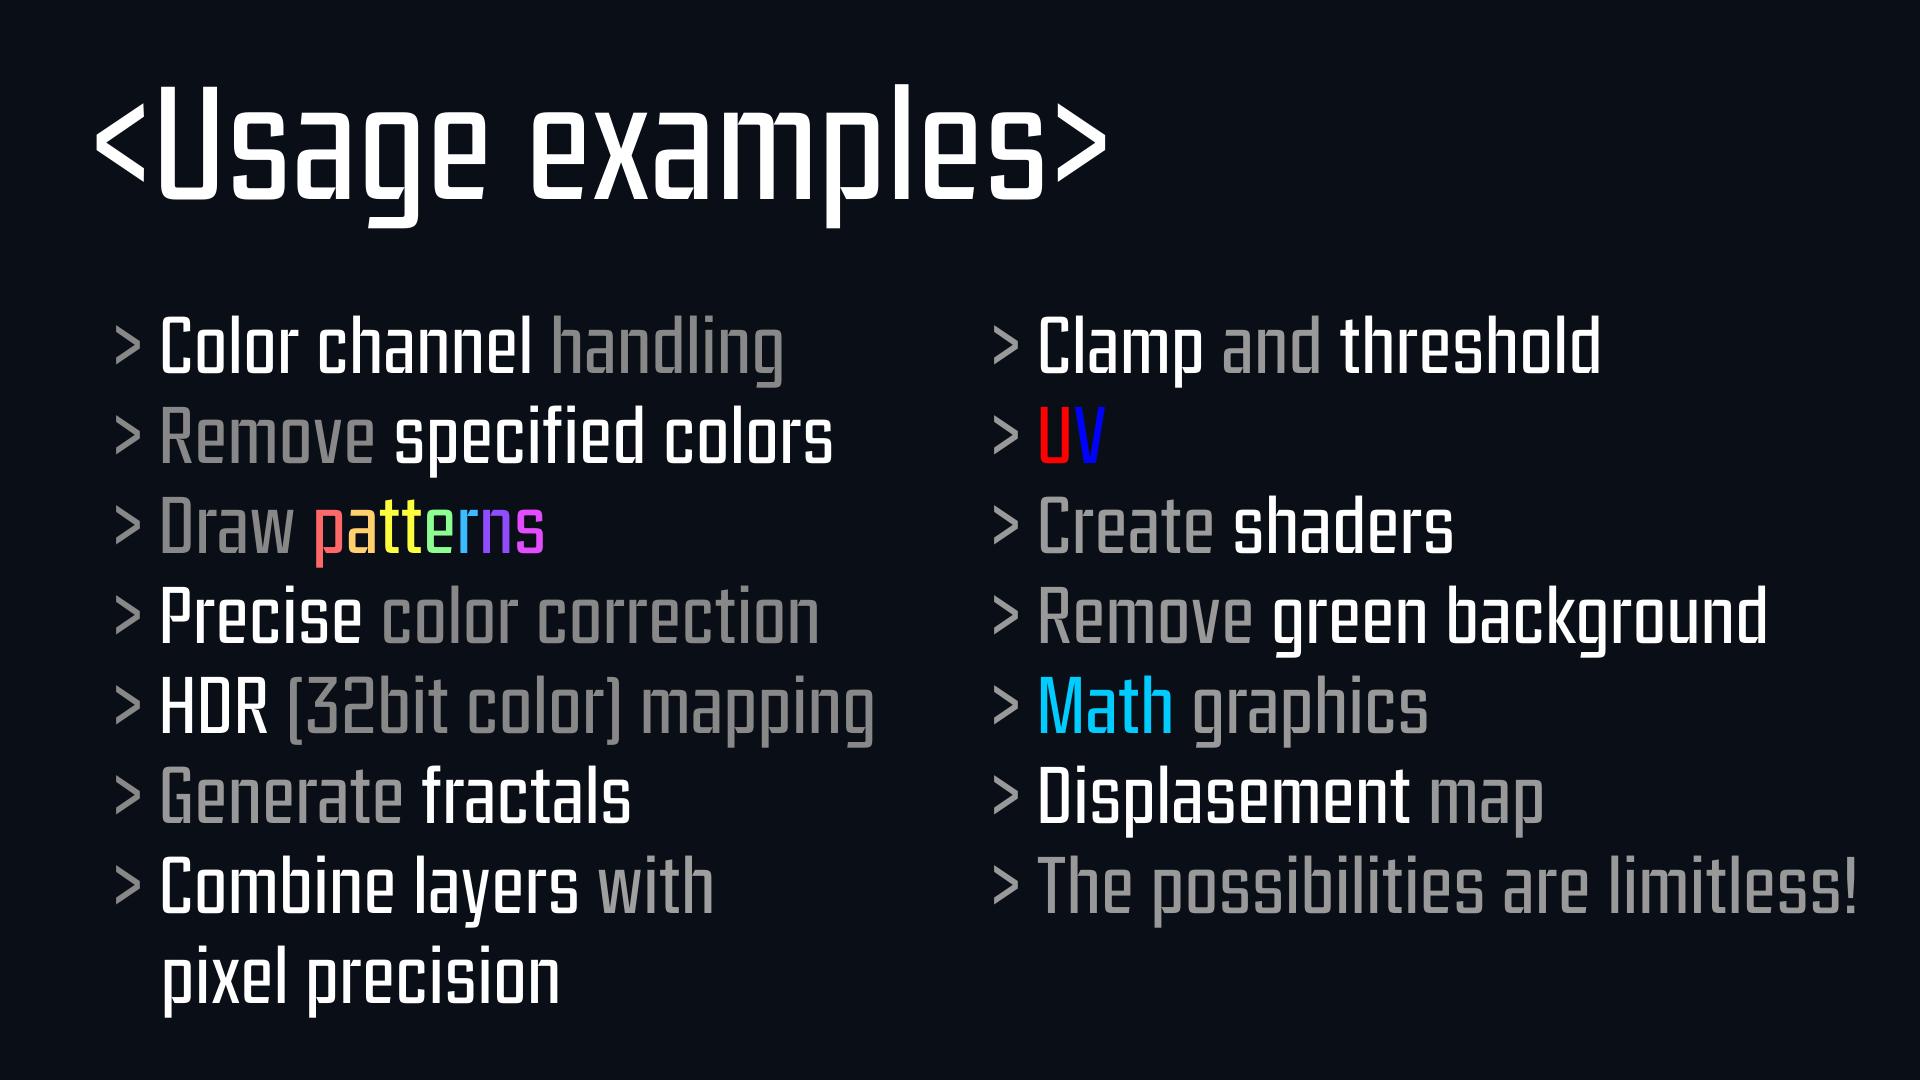 AE插件-PixelsCore v1.1 像素核心-(国人开发)用脚本代码语言控制图像视觉+ 国语教程 AE插件-第3张